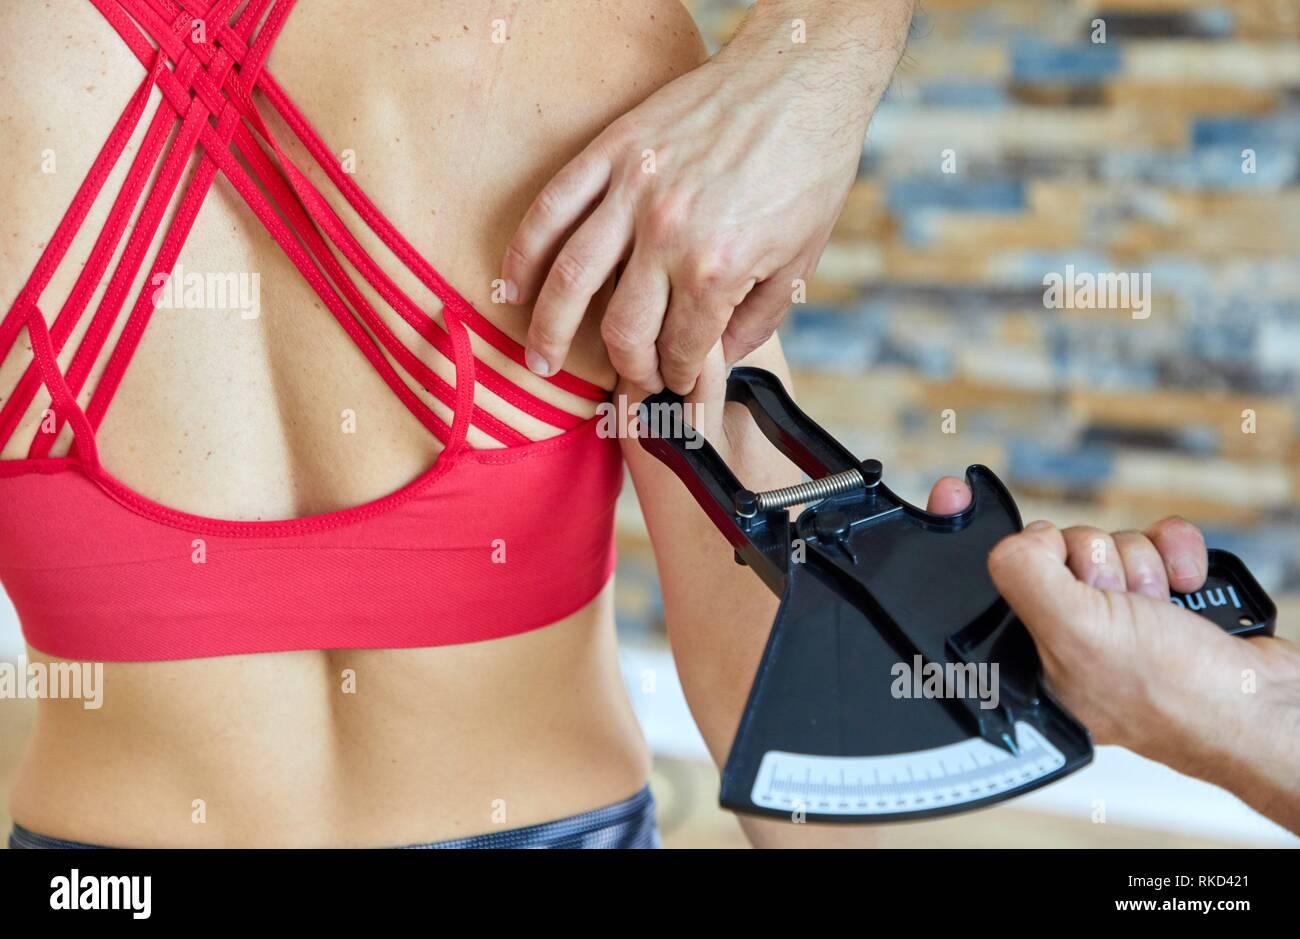 Measurement of creases, Nutritionist Consultation, Fitness center, Donostia, San Sebastian, Basque Country, Spain, Europe - Stock Image